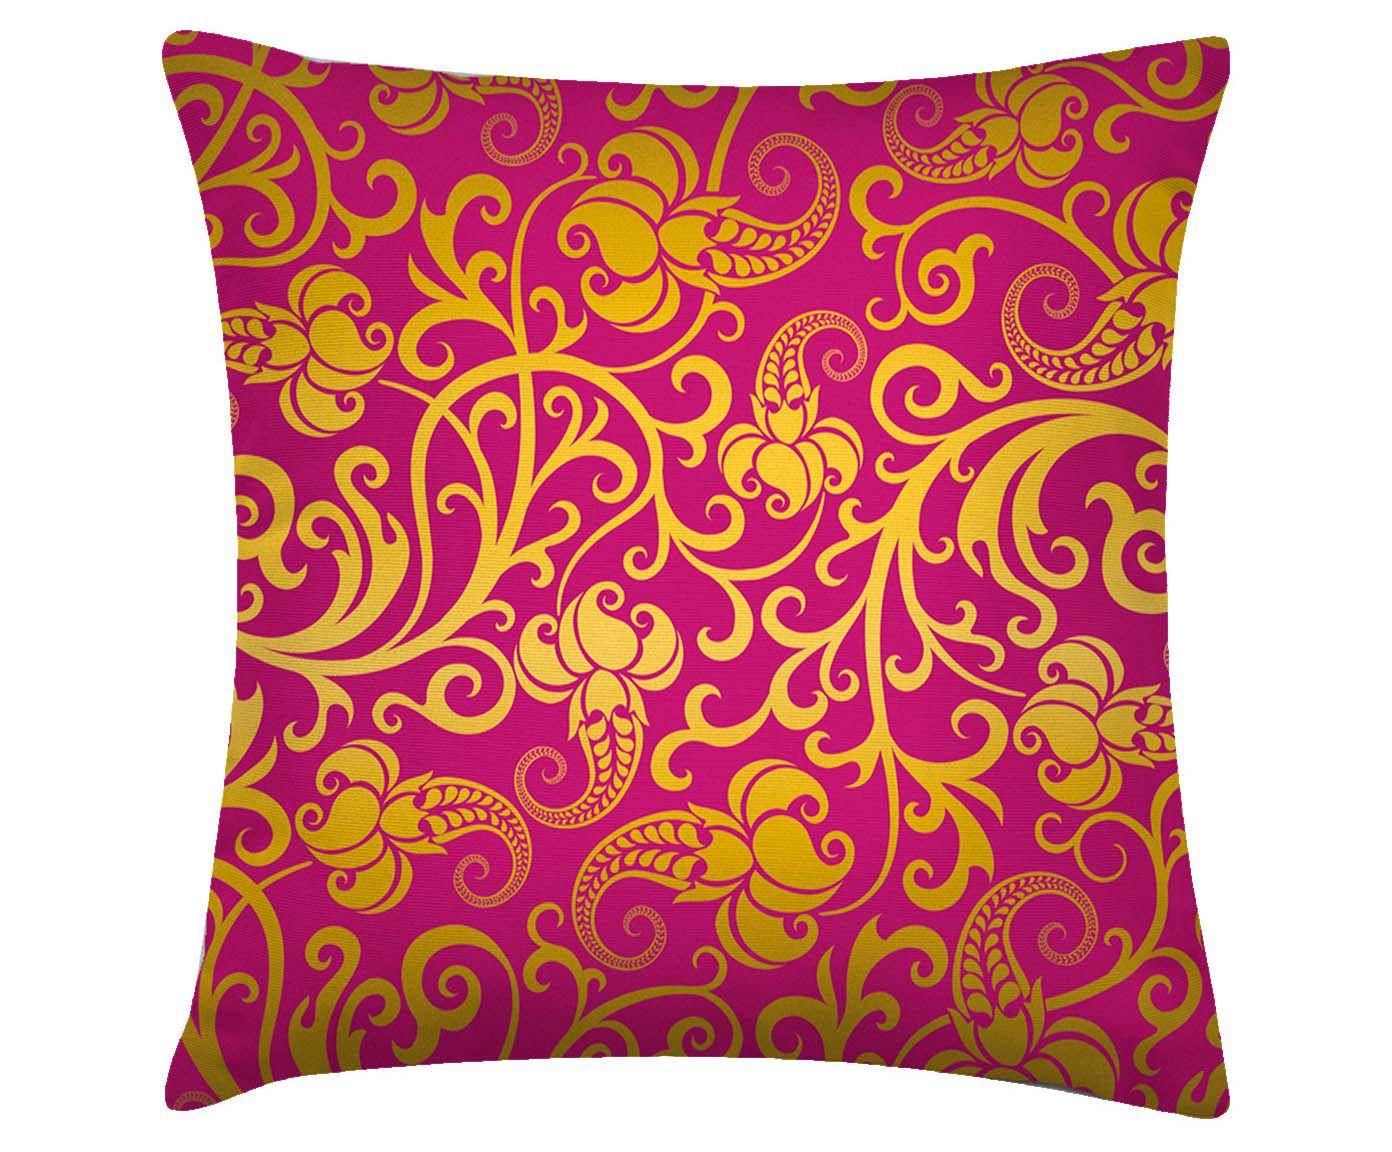 Capa para almofada india golden flowers - 40x40cm | Westwing.com.br